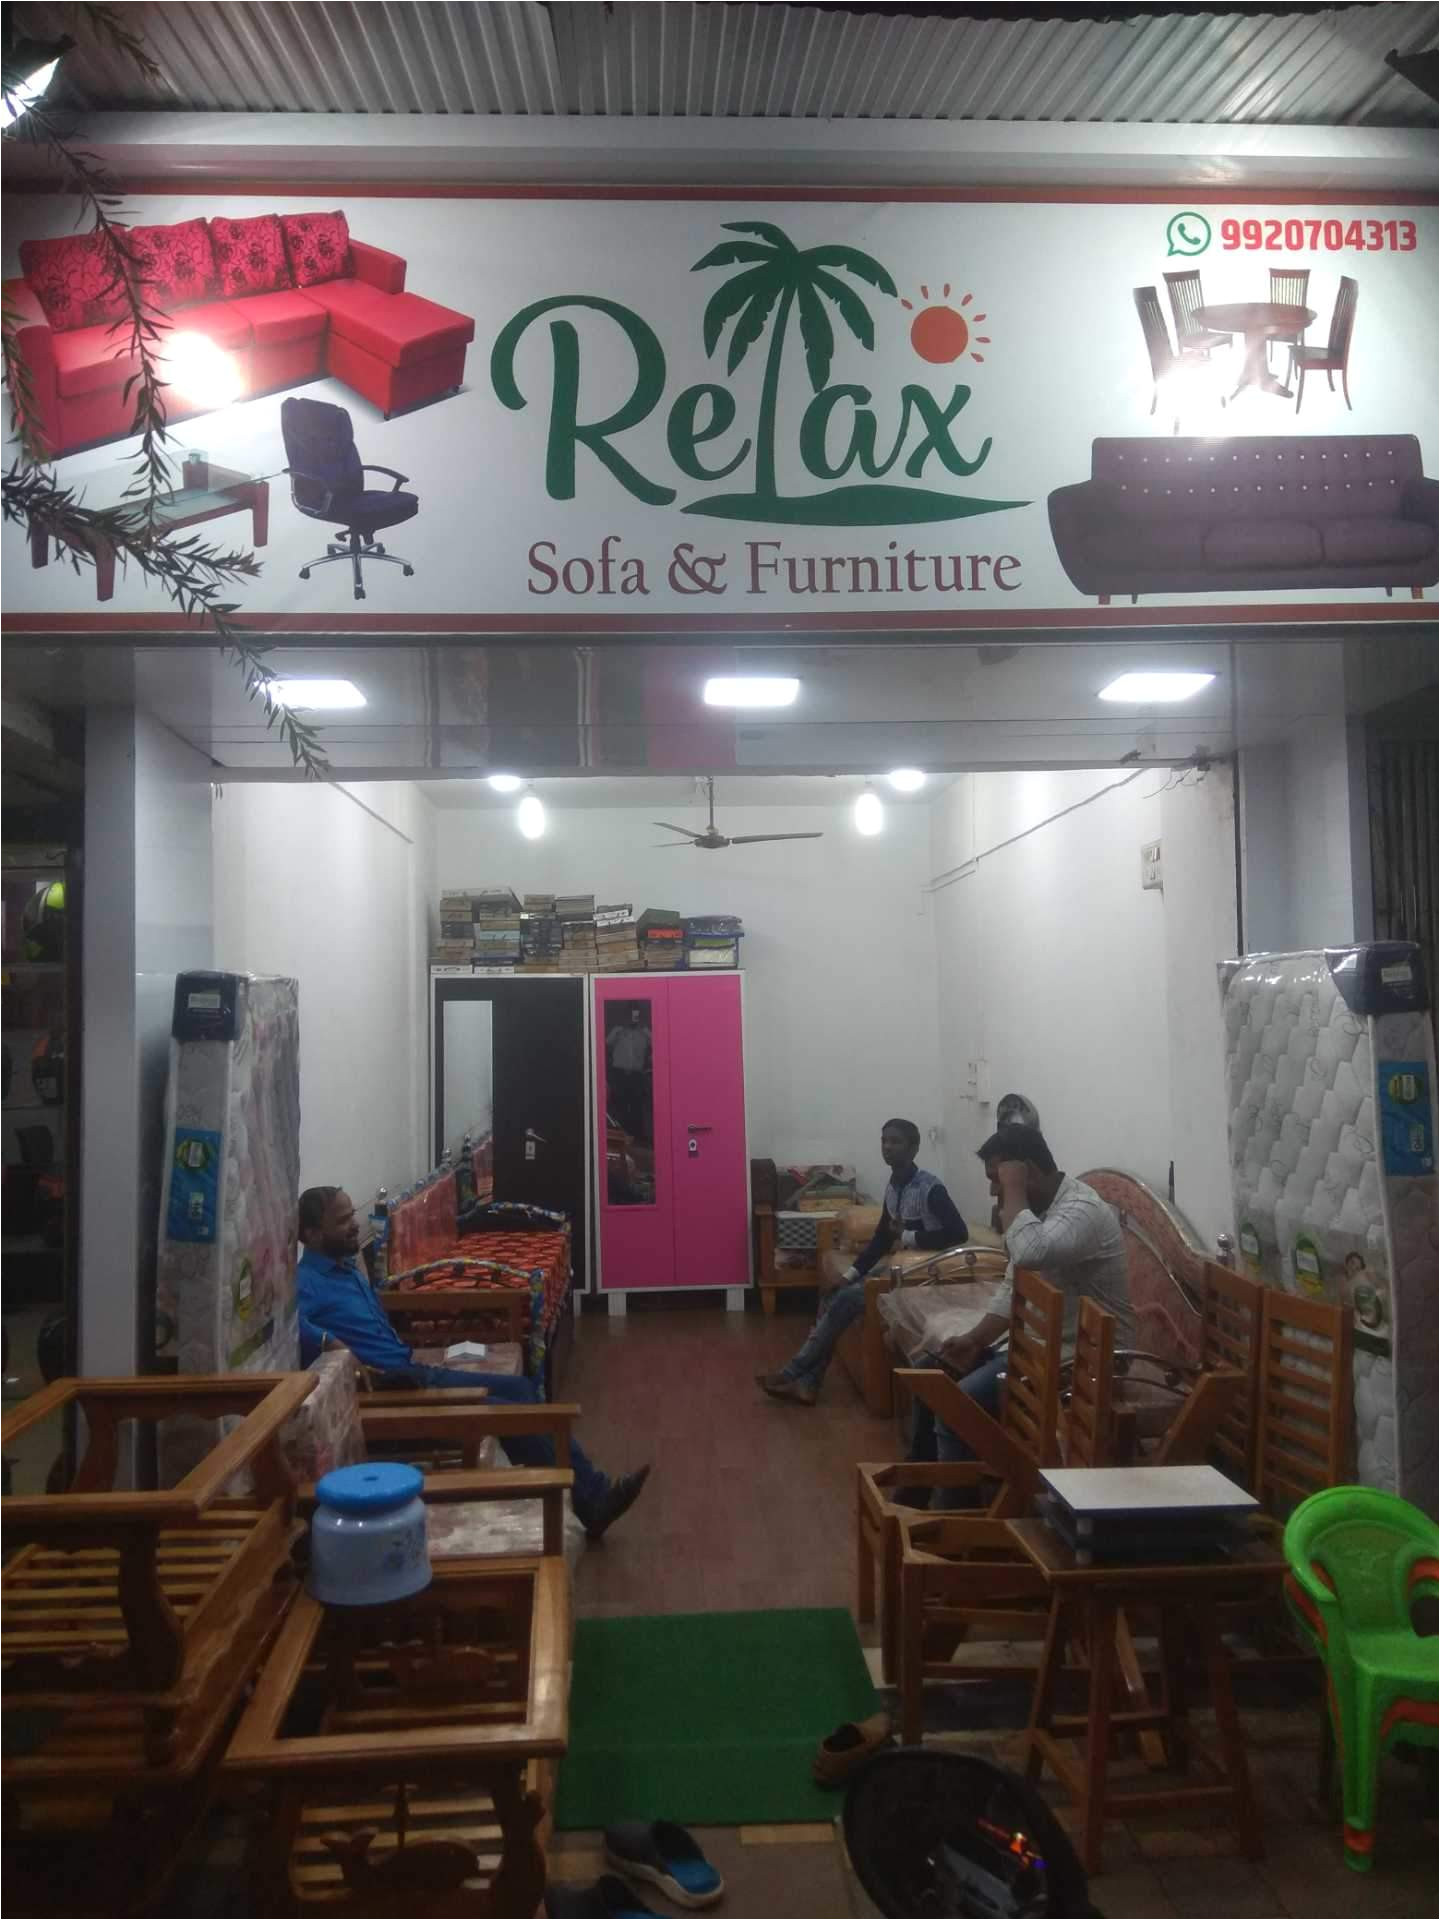 relax sofa and furniture dombivli east thane carpenters plrsfemxvu jpg